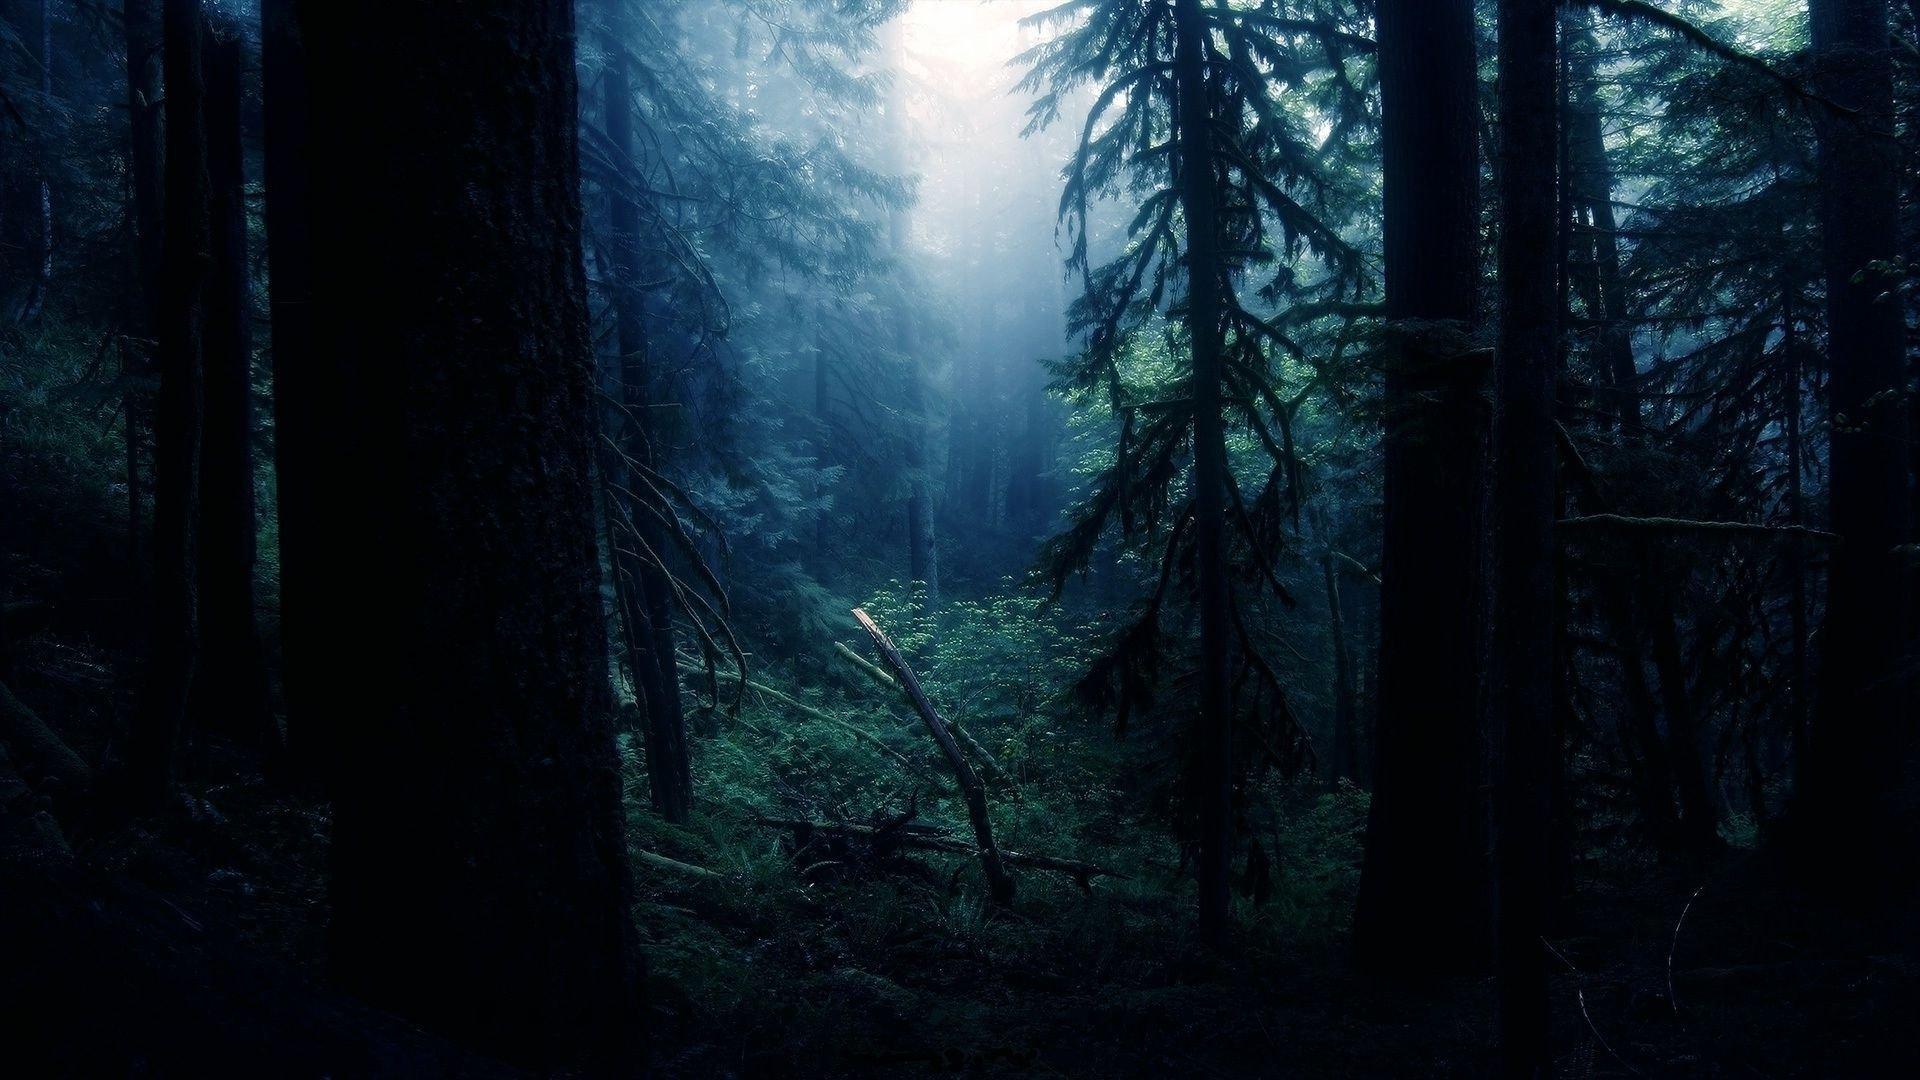 Forest Night Wallpaper Sf Wallpaper